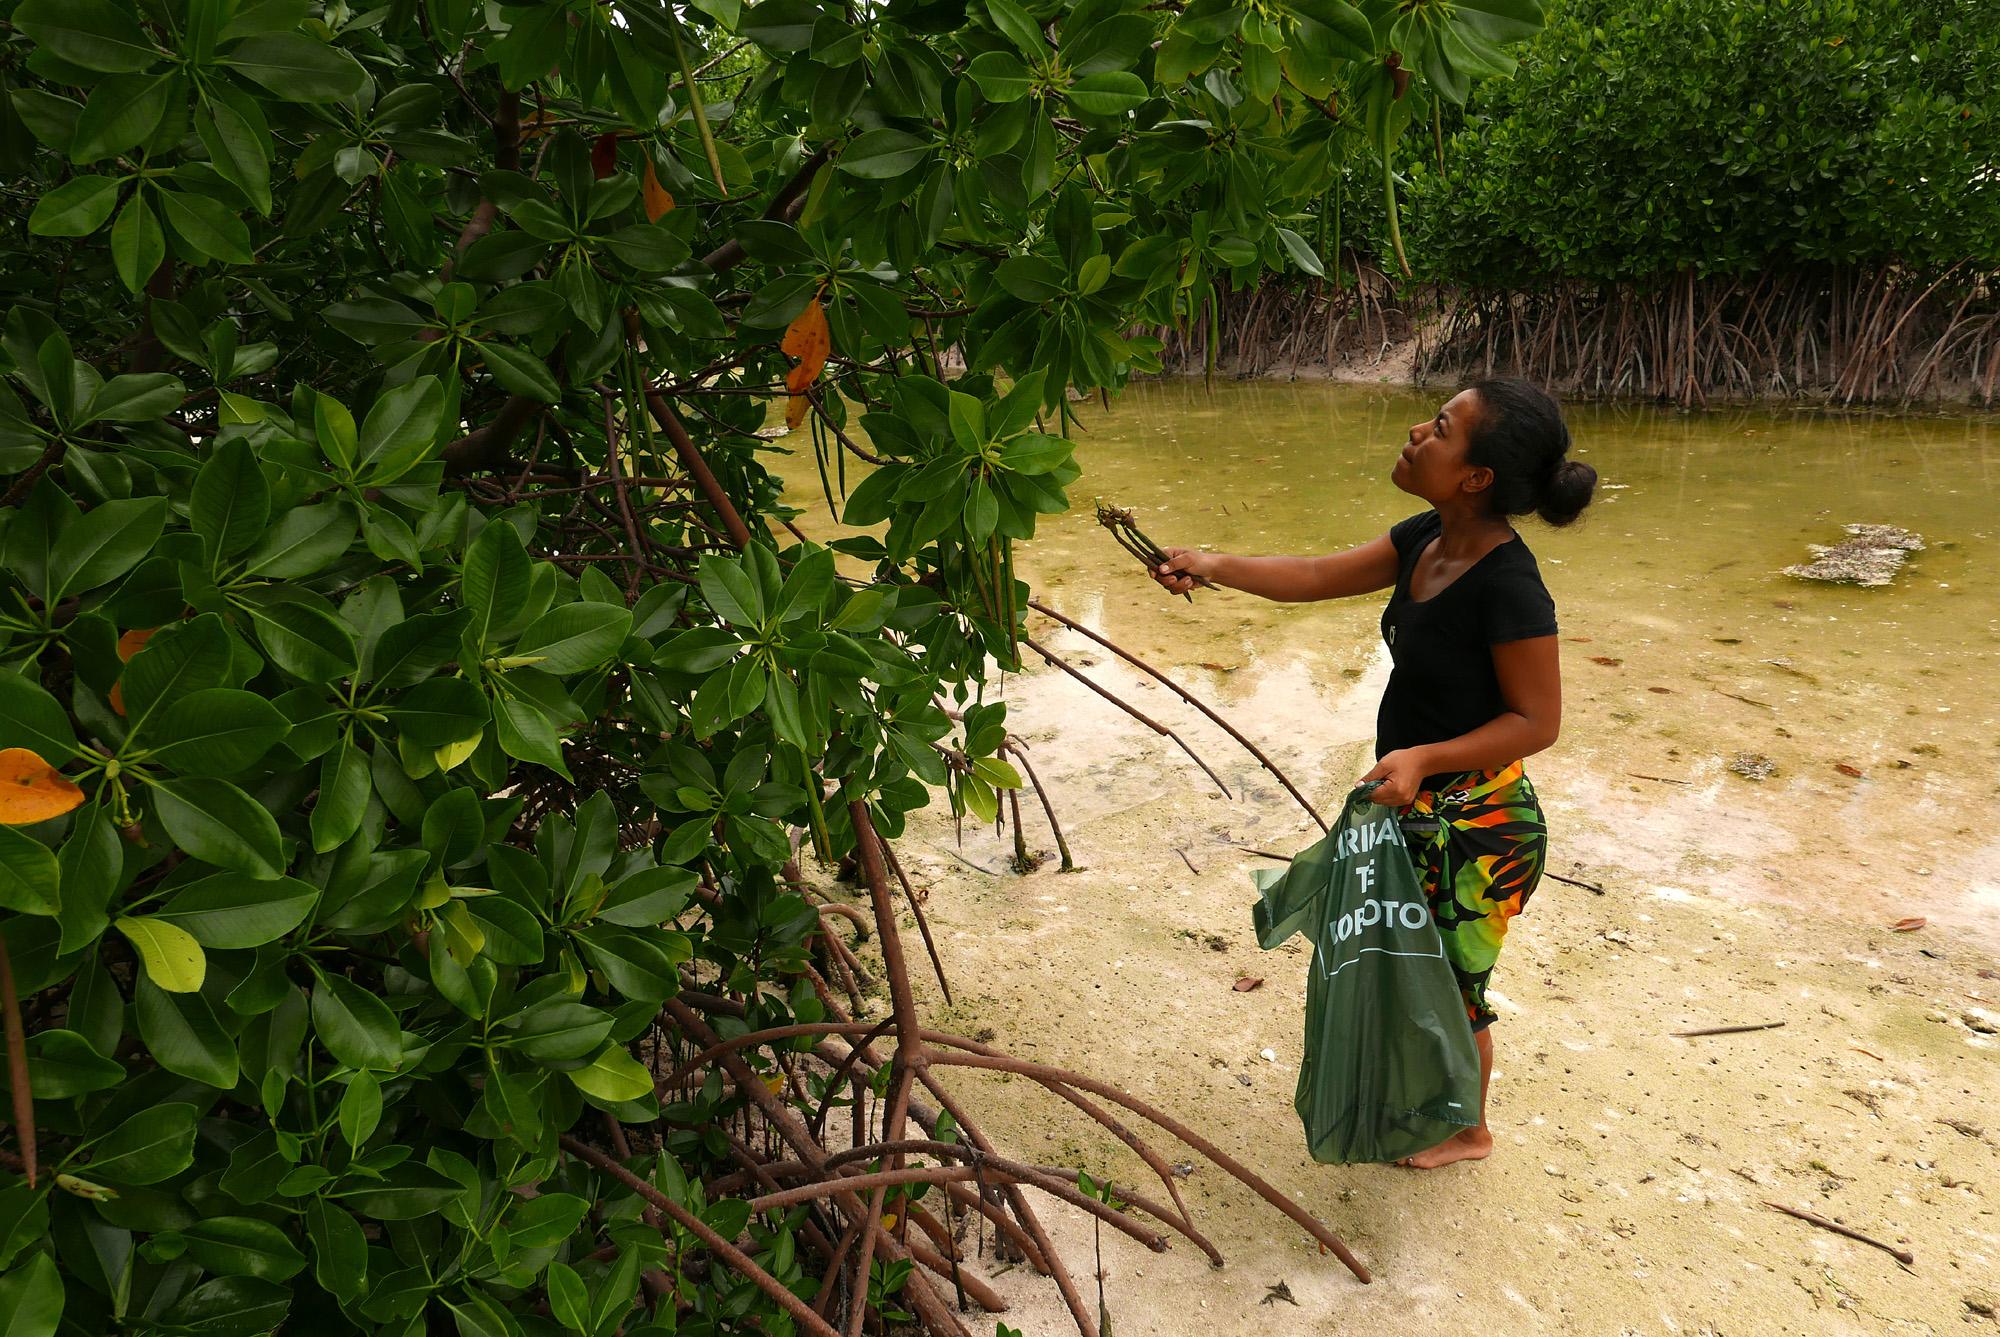 Tinaai Teaua picking mangrove seedlings to be planted in Kiribati. Photo by Kennedy Warne.